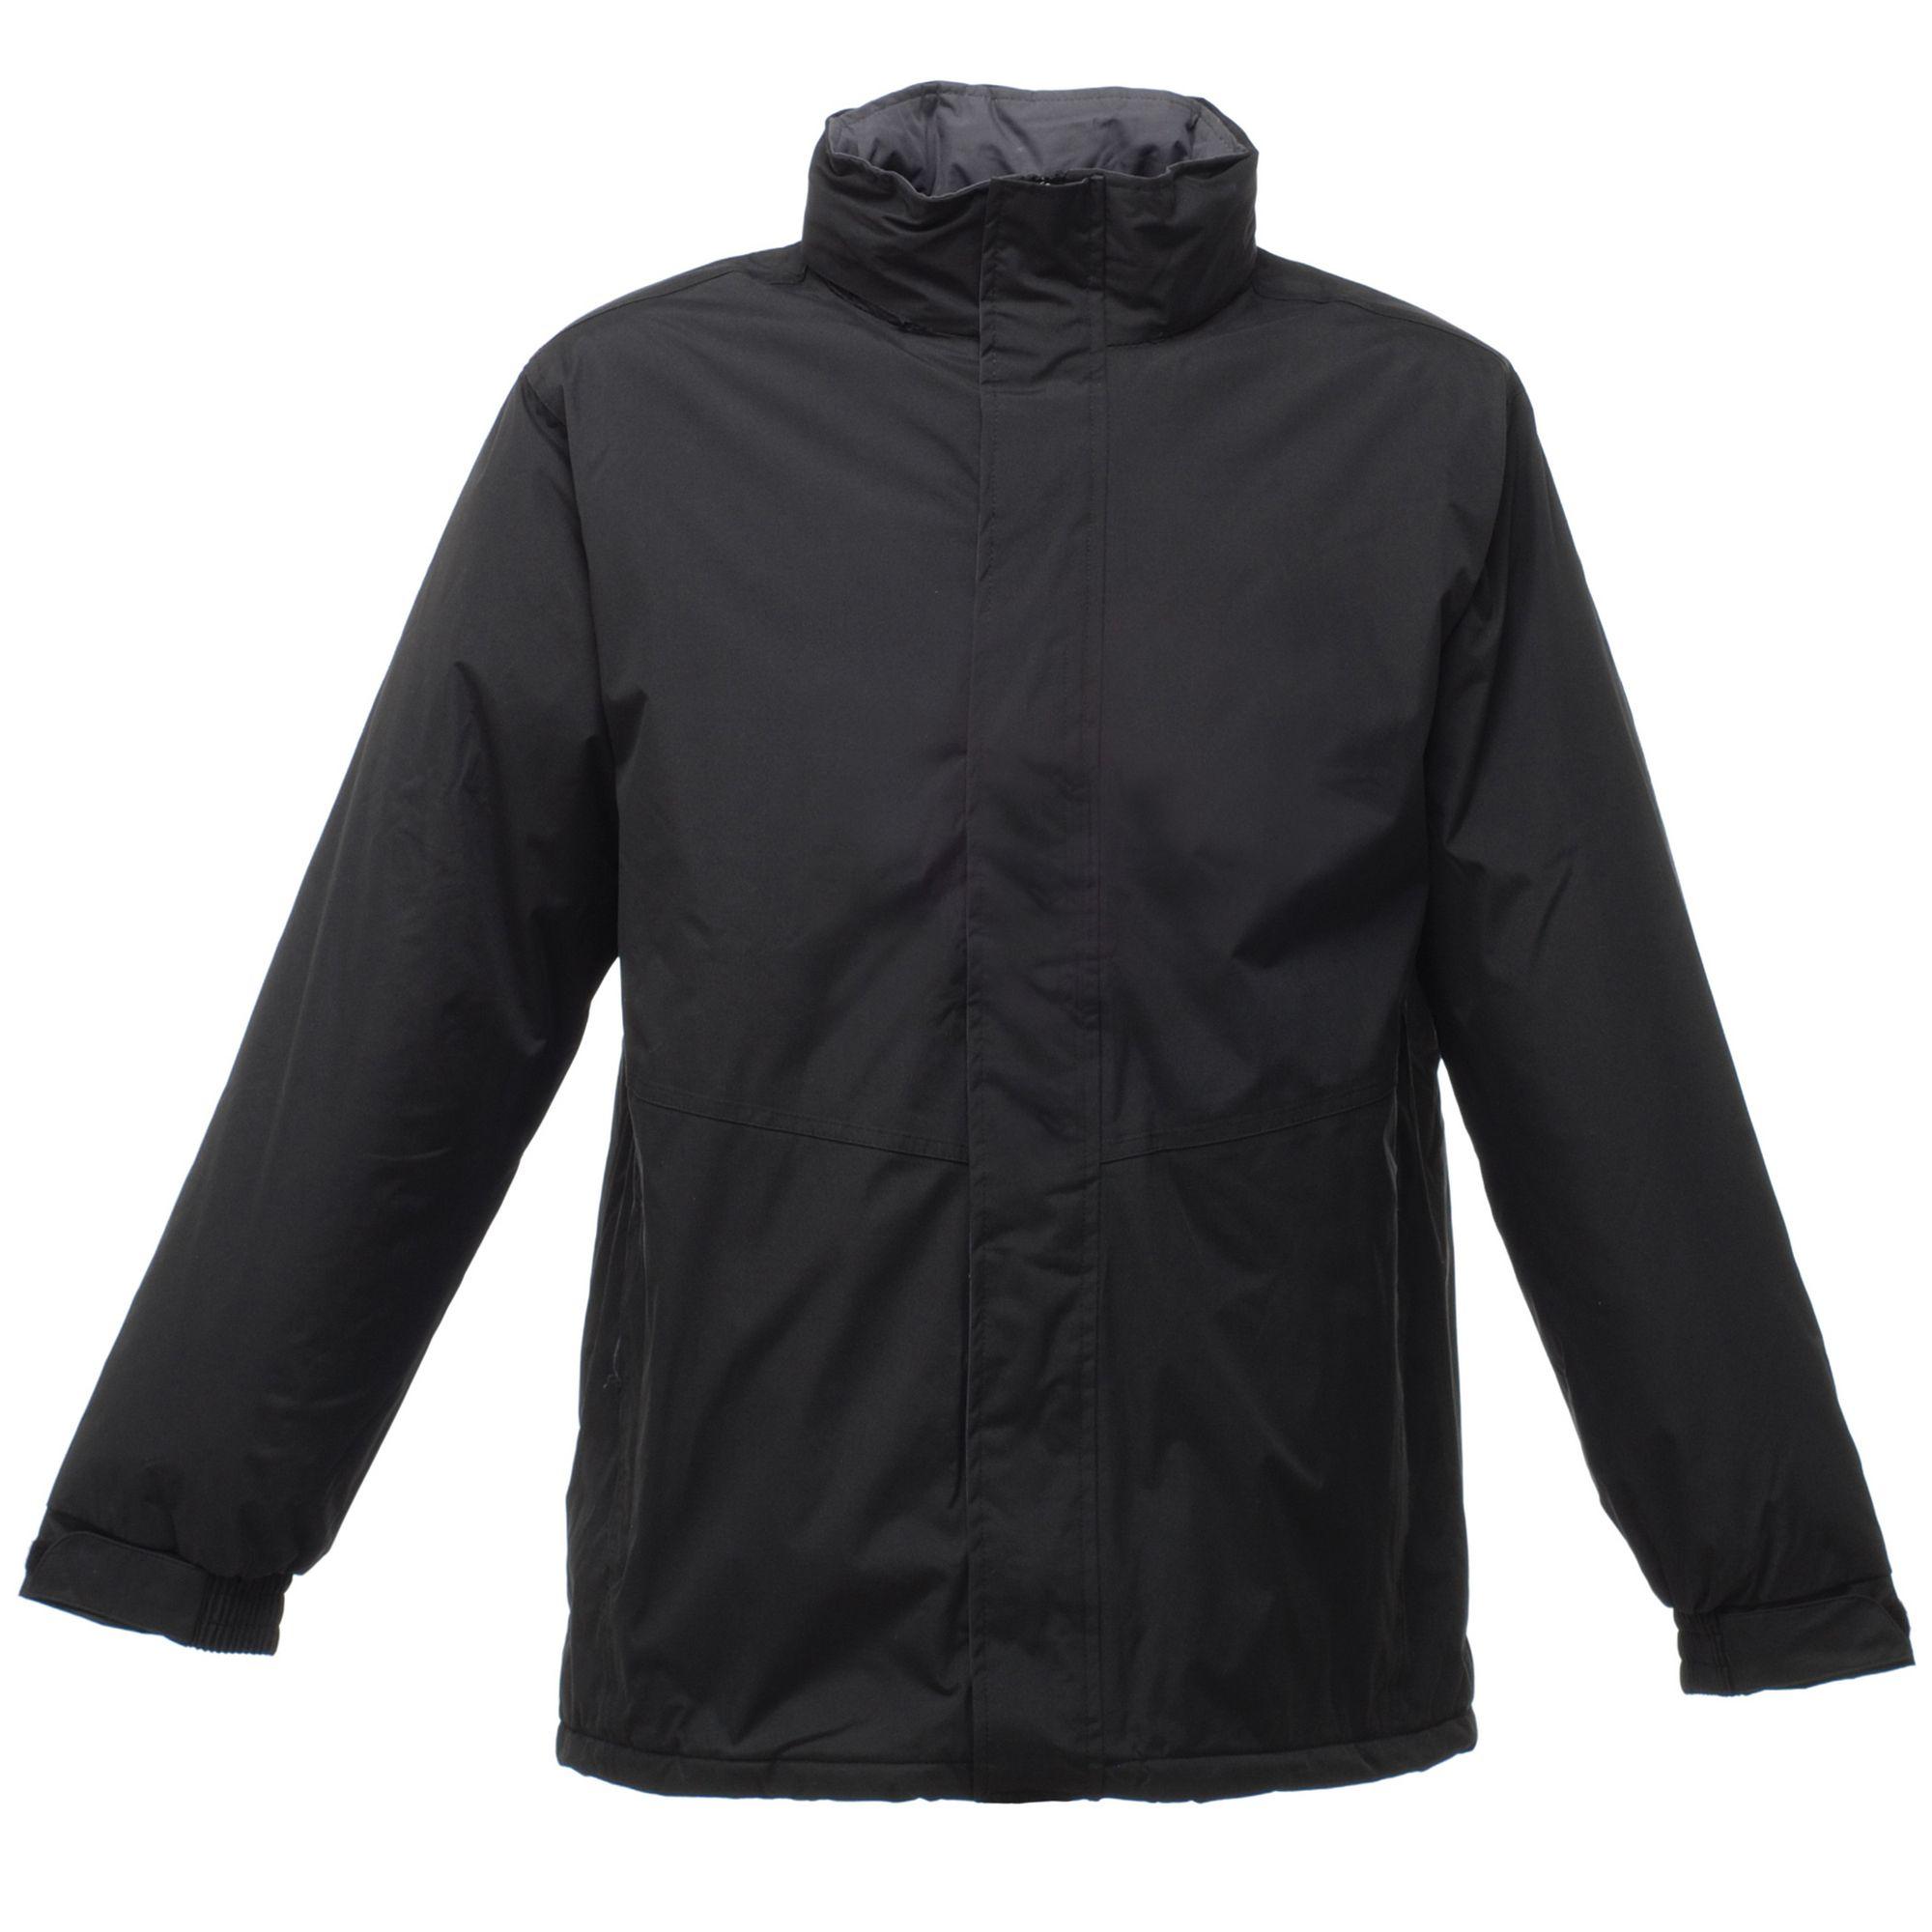 Regatta Womens/Ladies Beauford Insulated Waterproof Windproof Performance Jacket